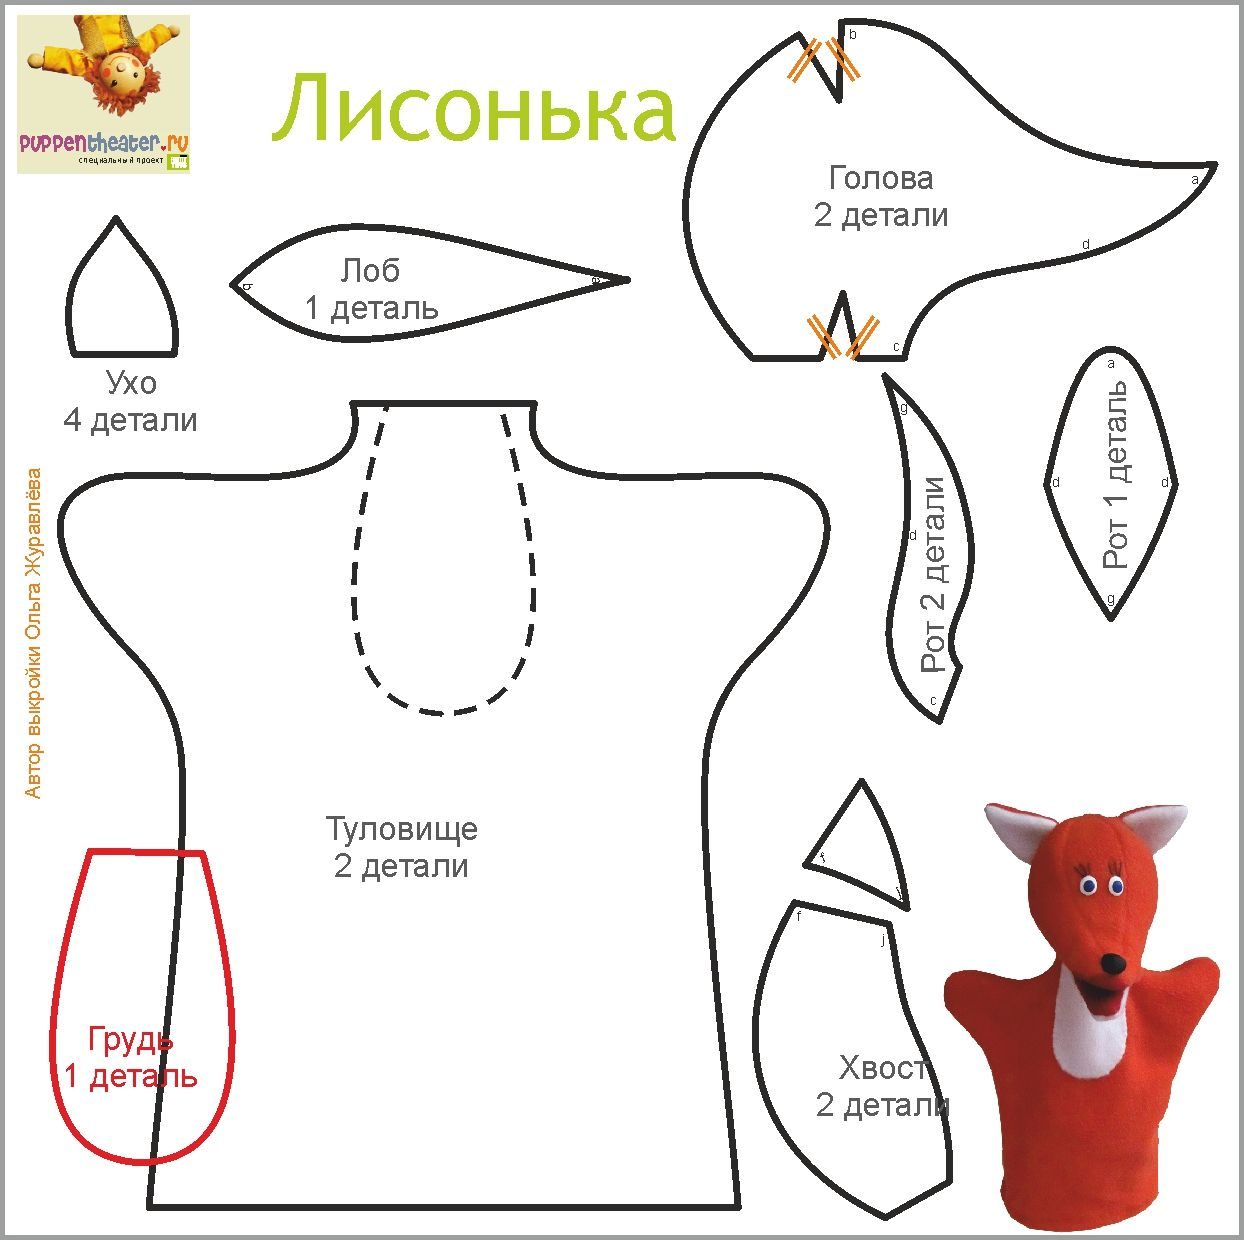 http://puppentheater.ru/Vikroiki/Lisonk-oz-vkr.jpg